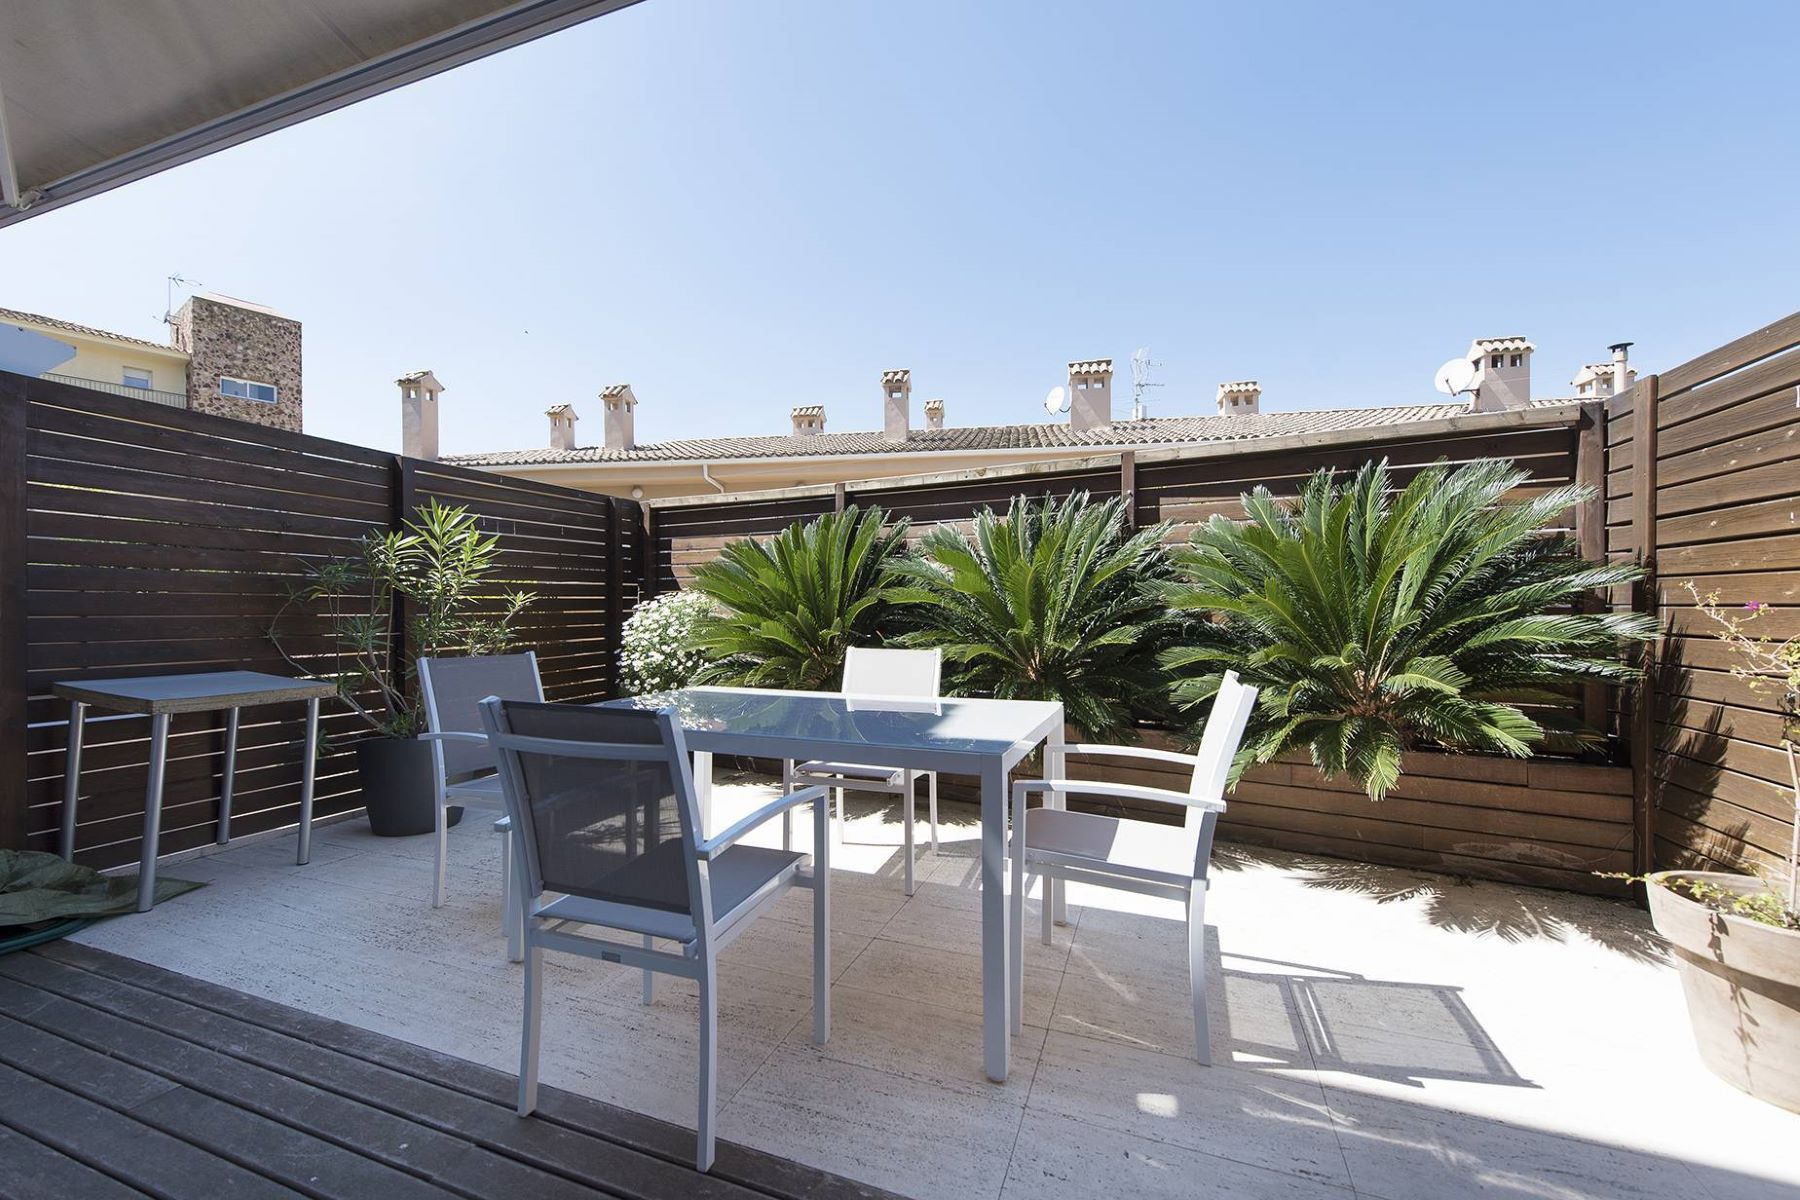 Moradia para Venda às Lovely terraced house 600m from Sa Conca beach S'Agaro, Costa Brava, 17248 Espanha